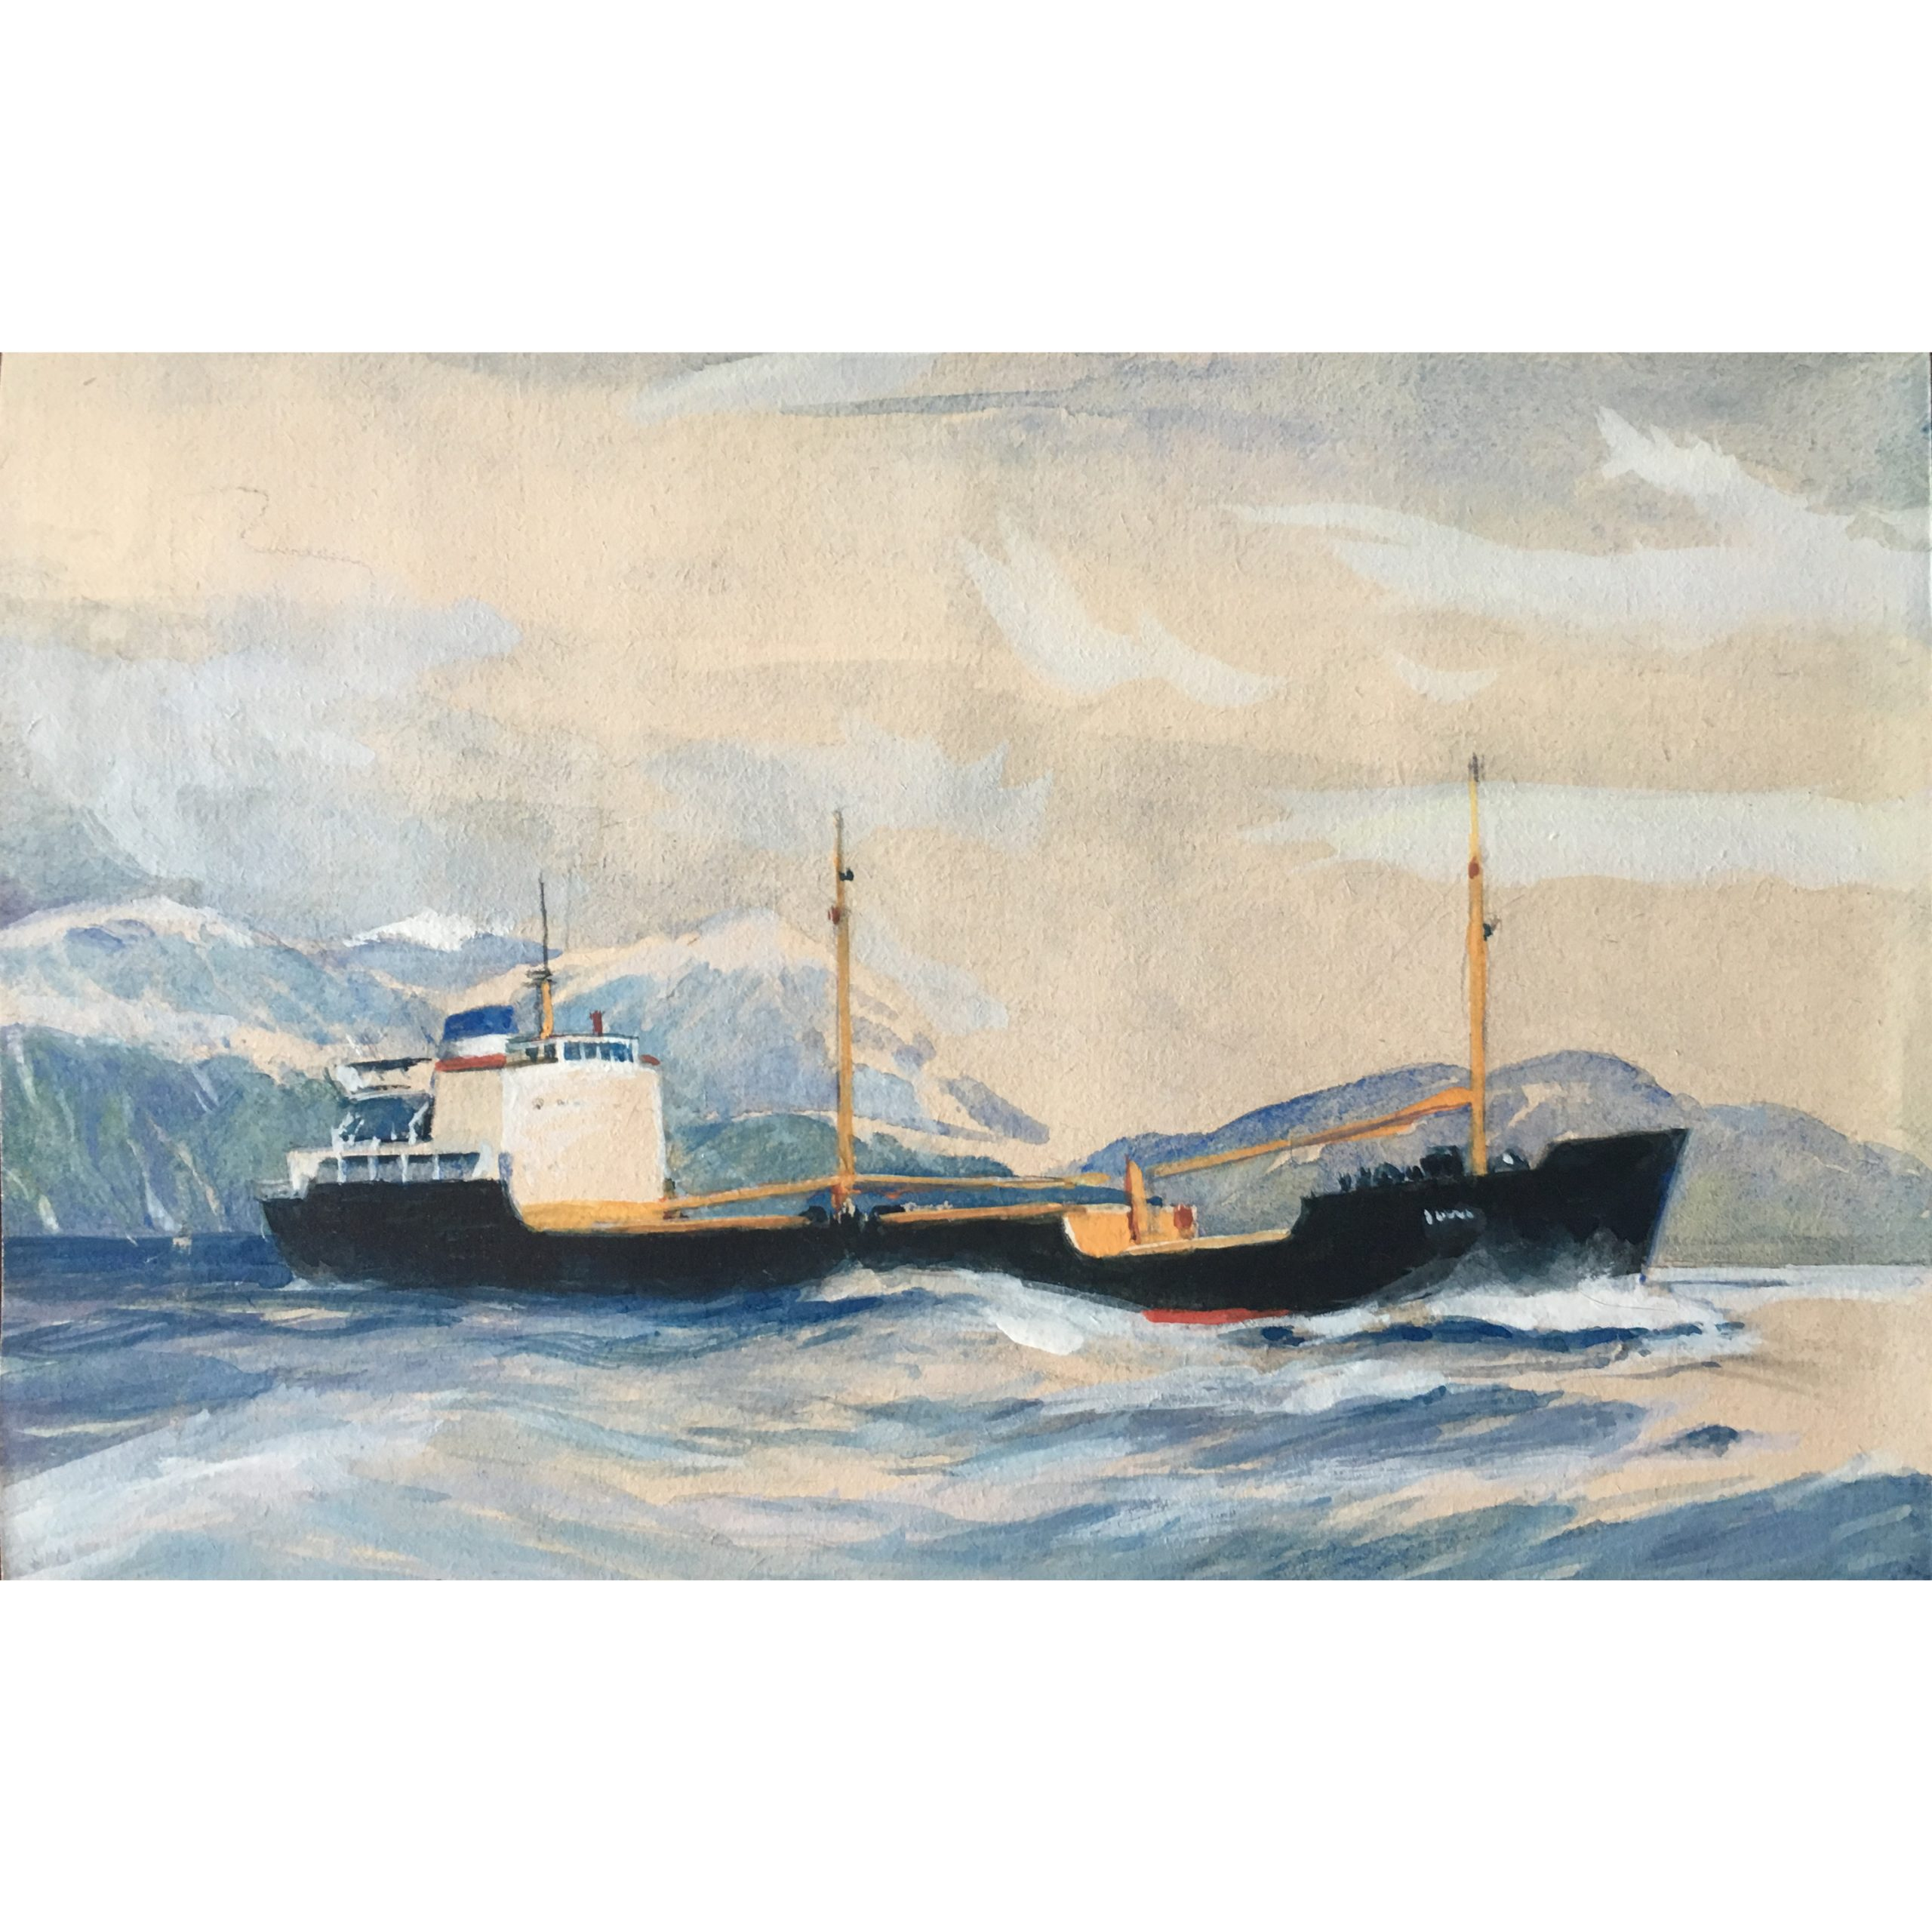 Laurence Dunn Otra painting maritime art ship boat coastal shipping